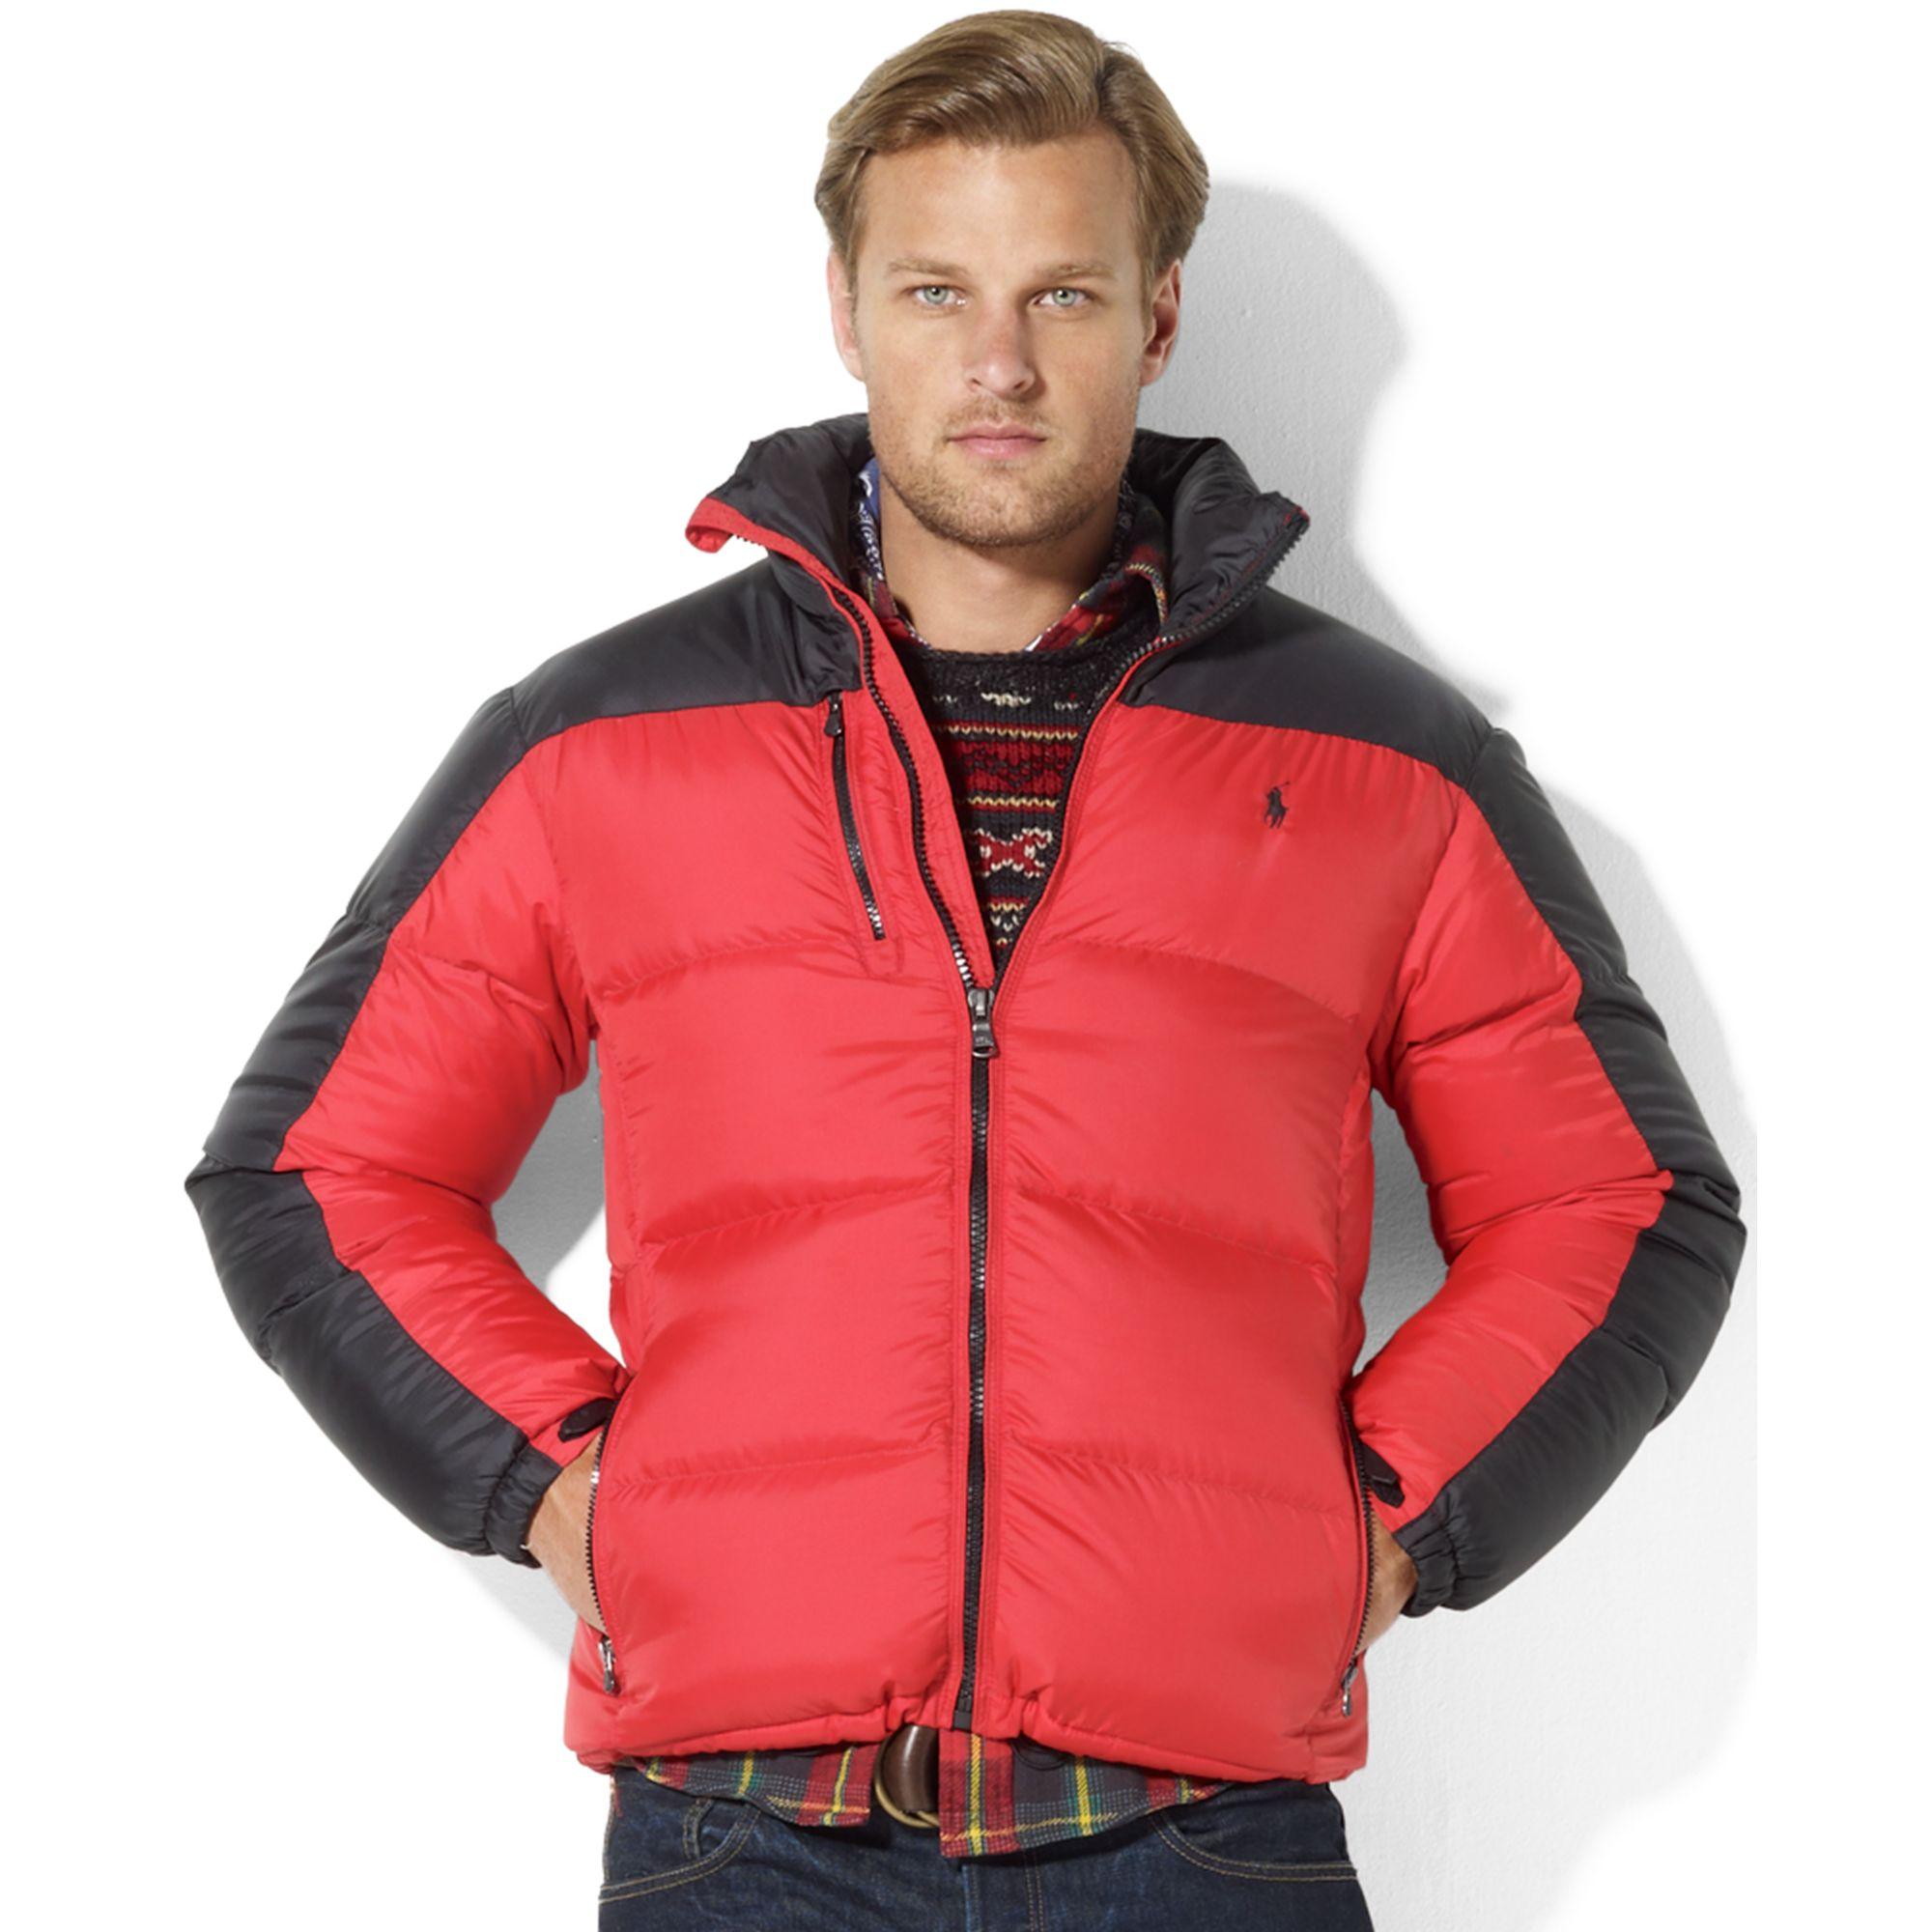 b558d4e07f5 Lyst - Ralph Lauren Snow Polo Core Trek Down Jacket in Red for Men